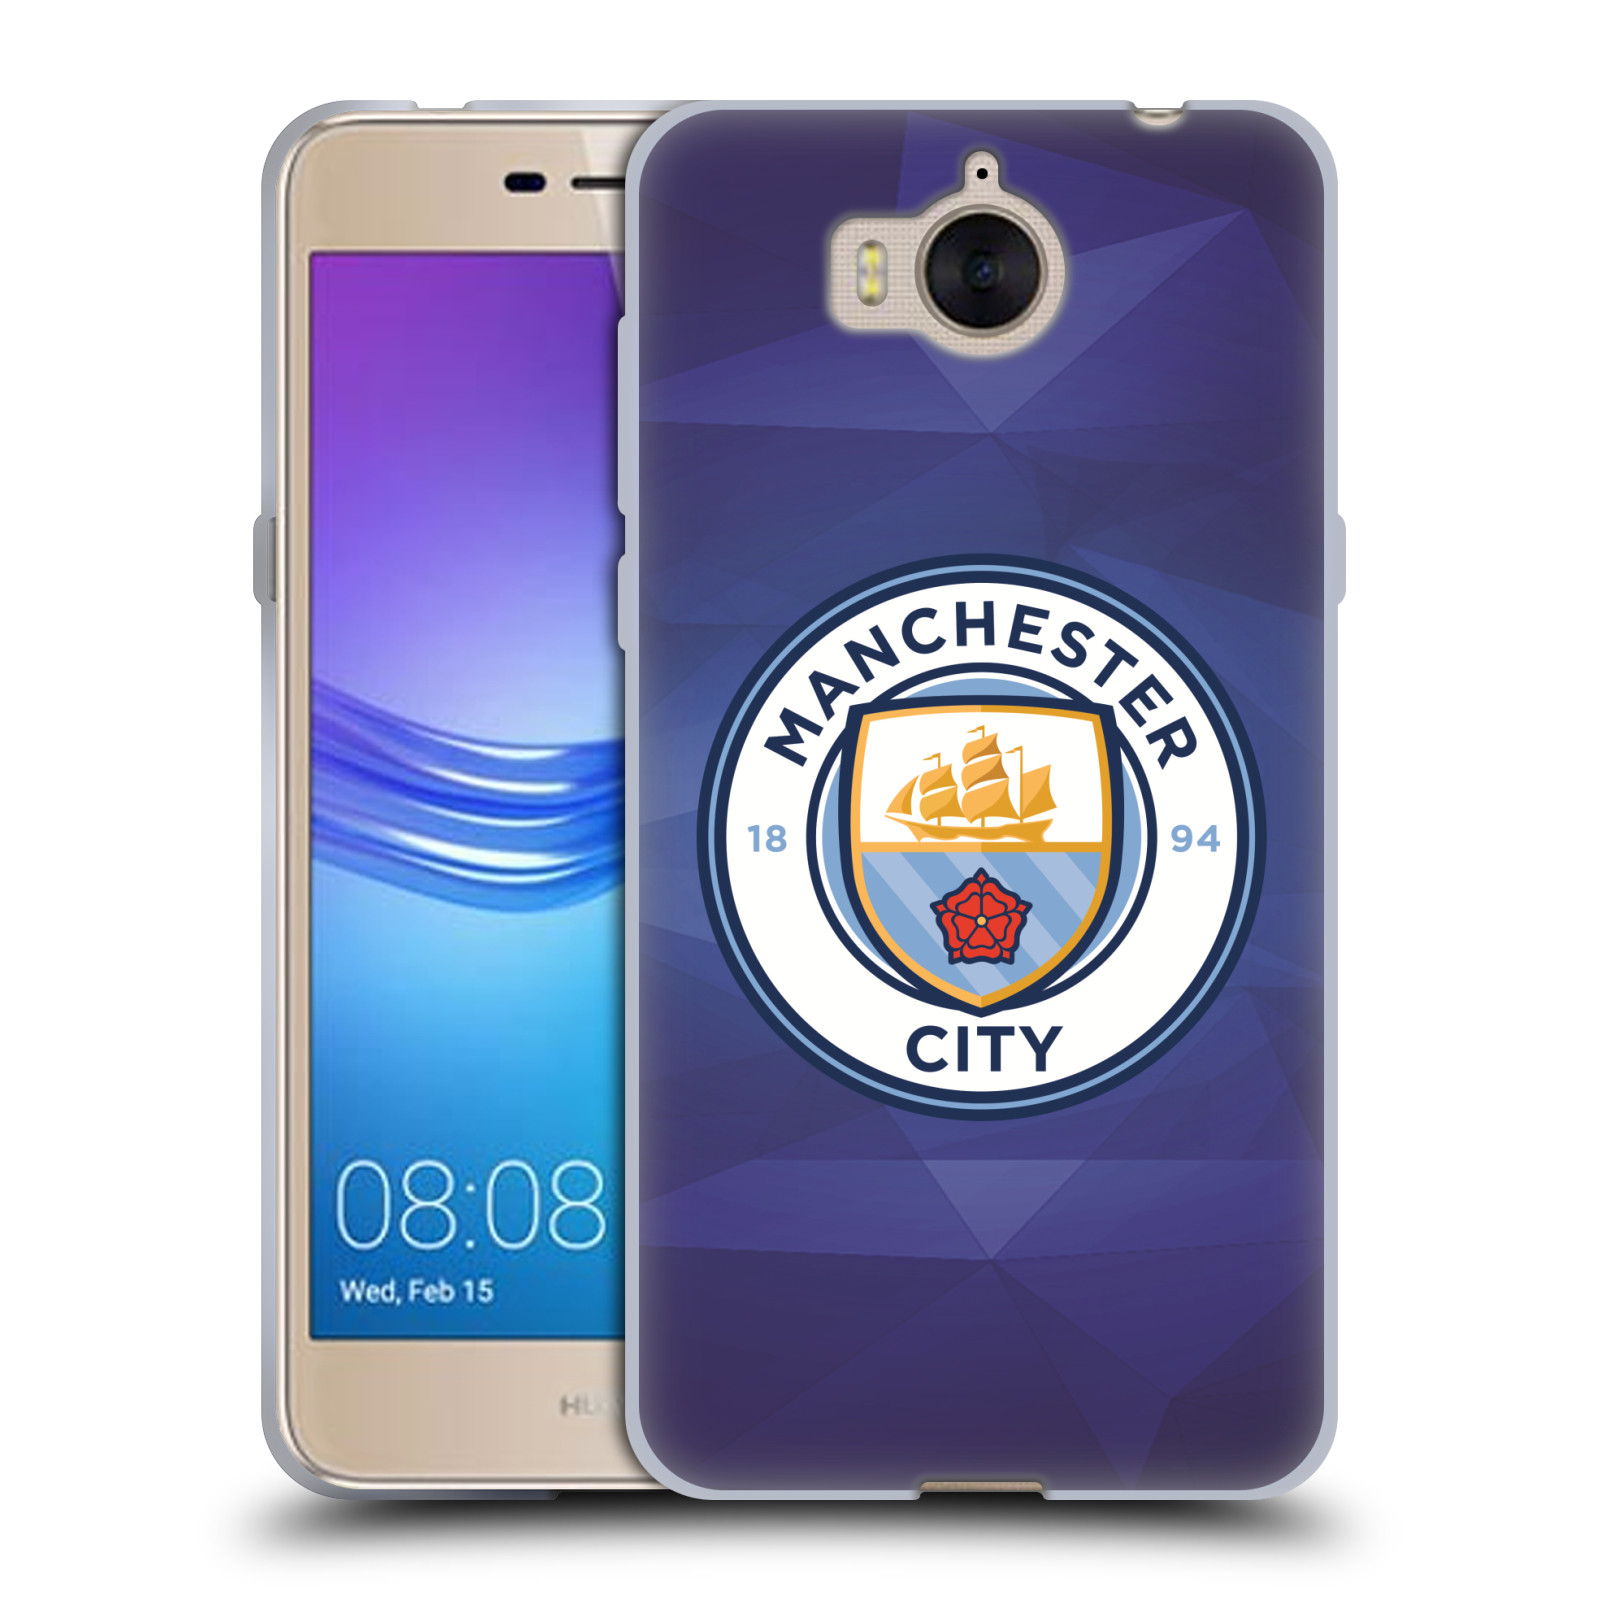 Silikonové pouzdro na mobil Huawei Y6 2017 - Head Case - Manchester City FC - Modré nové logo